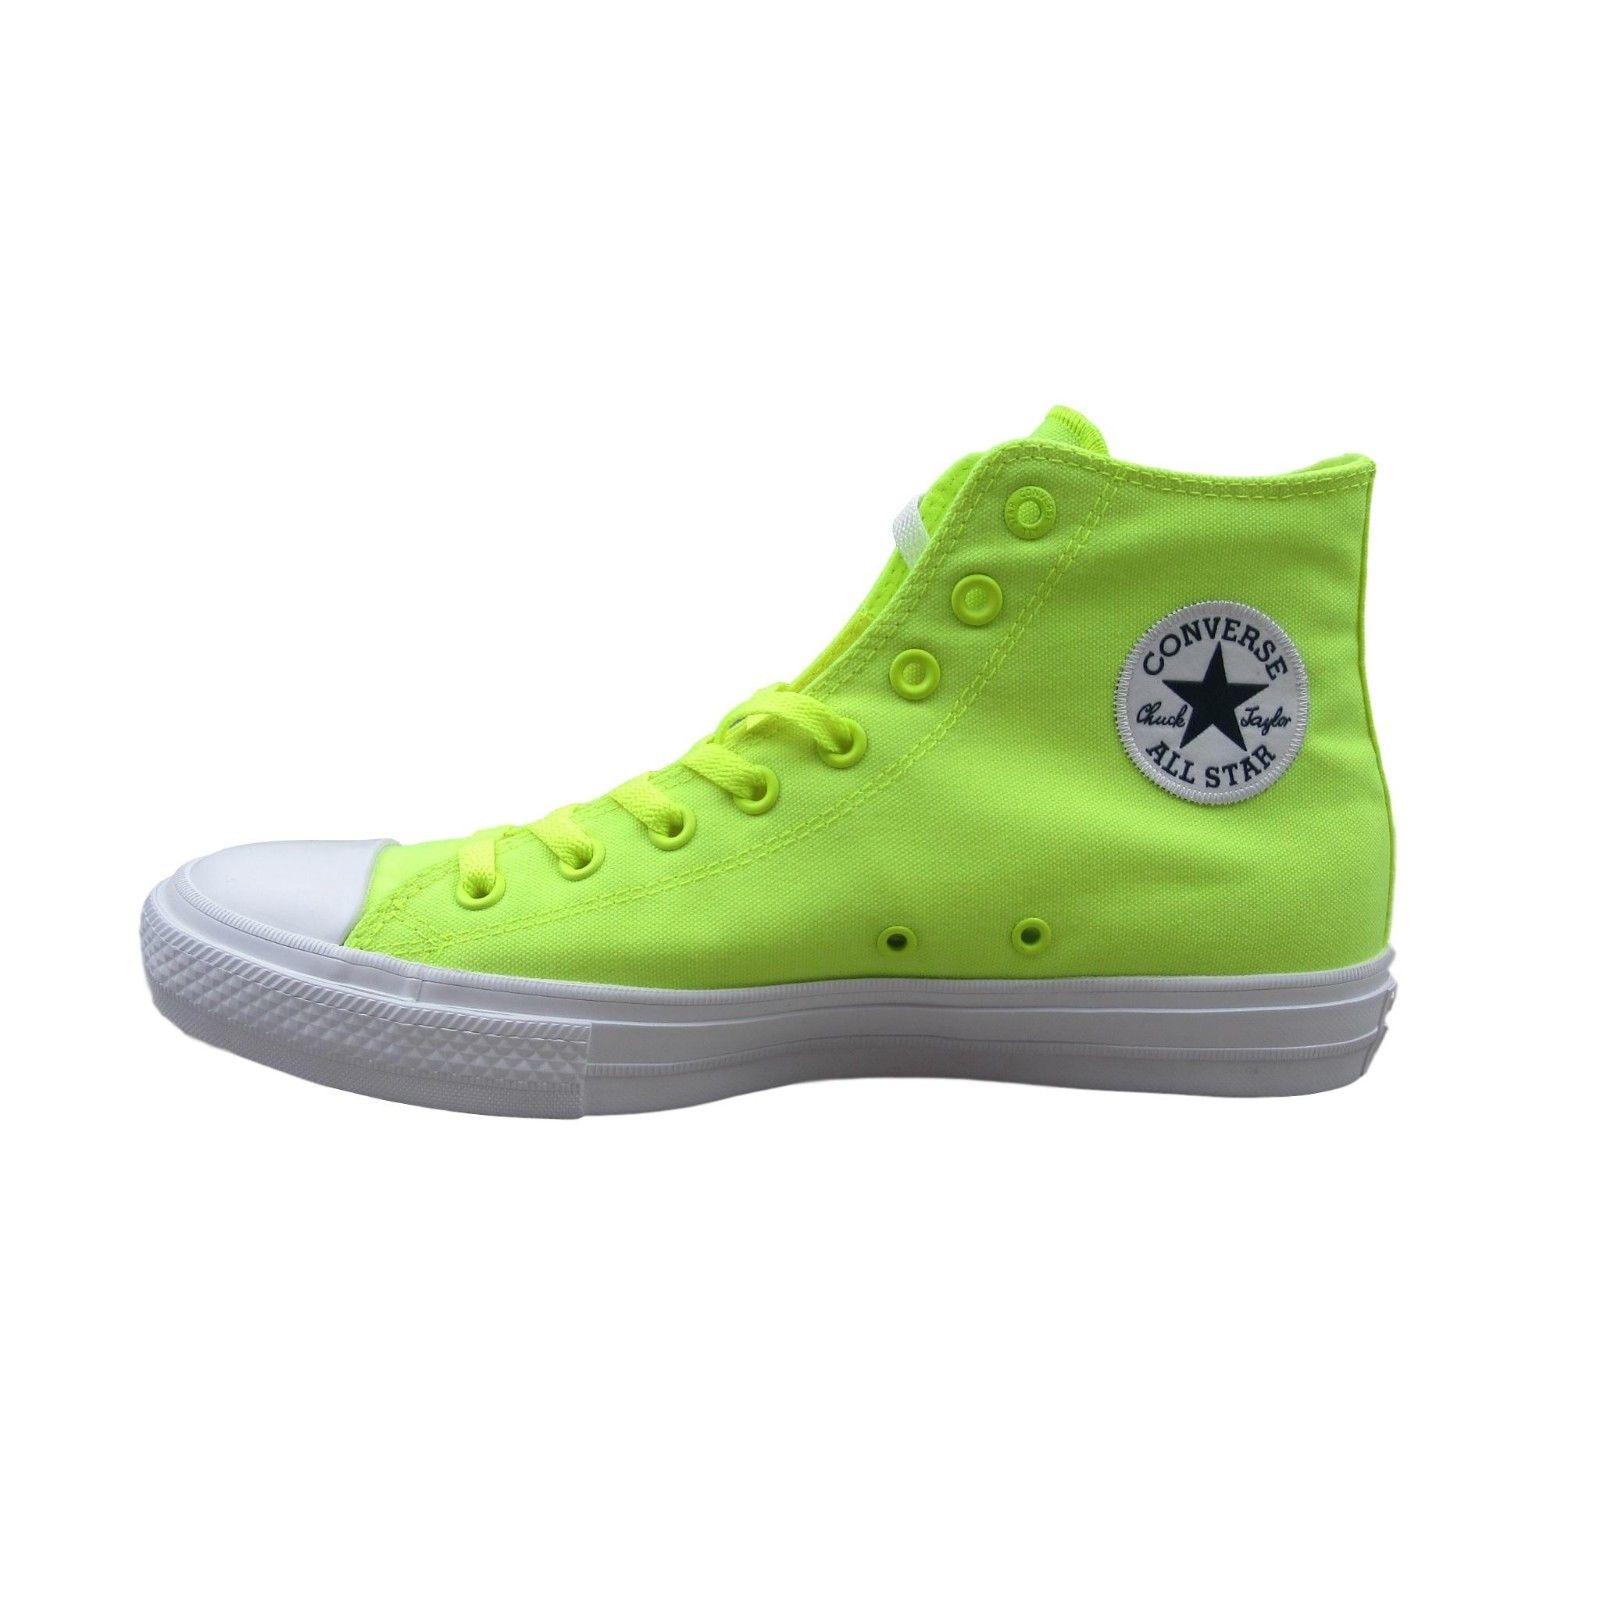 5698ecc9dd625c Converse Chuck Taylor All Star II Size 10 Mens Lunarlon Volt Green ...